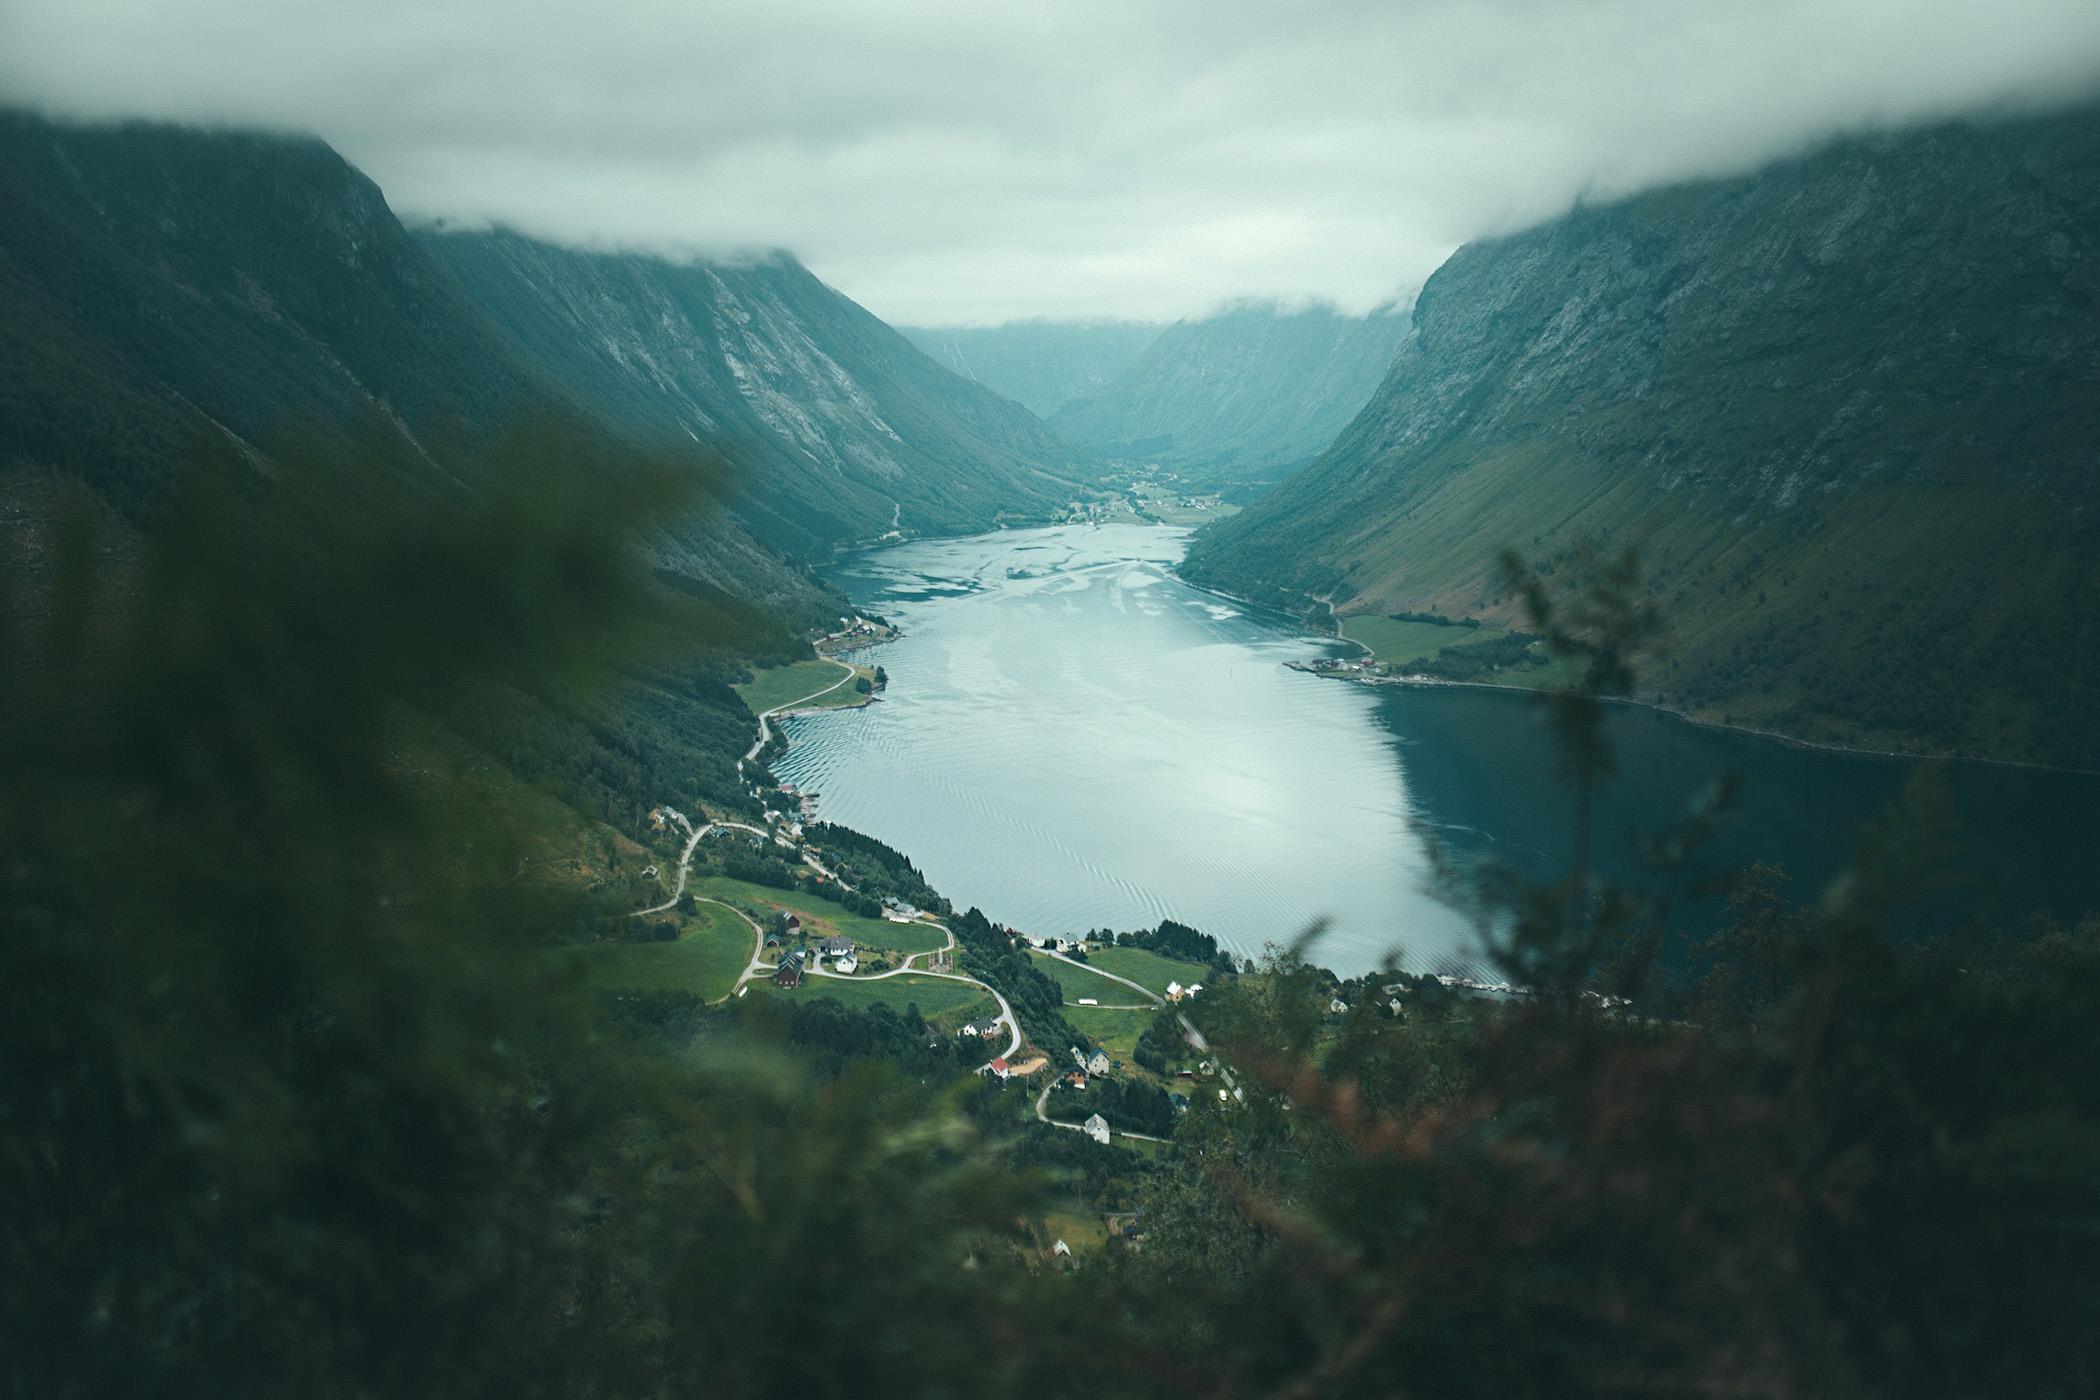 szlak na Saksę, widok na Øye